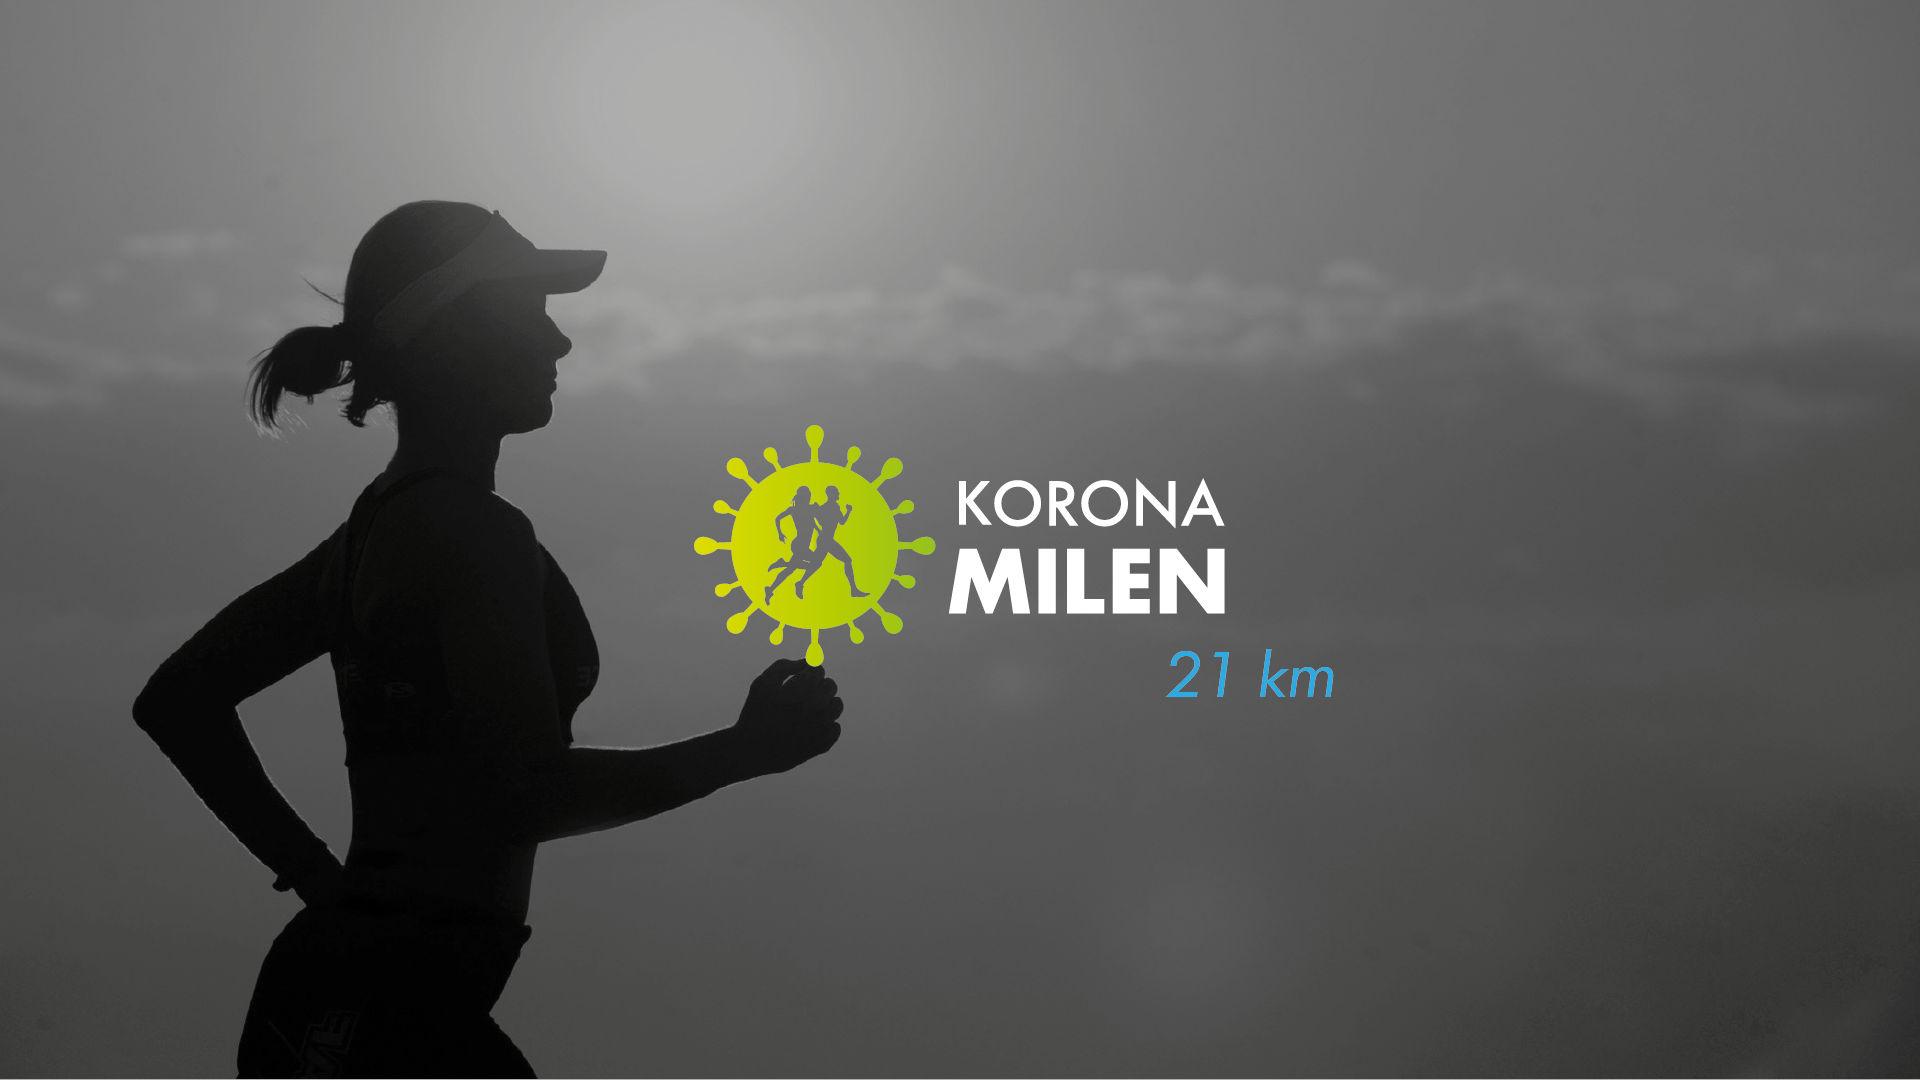 Koronamilen 21km